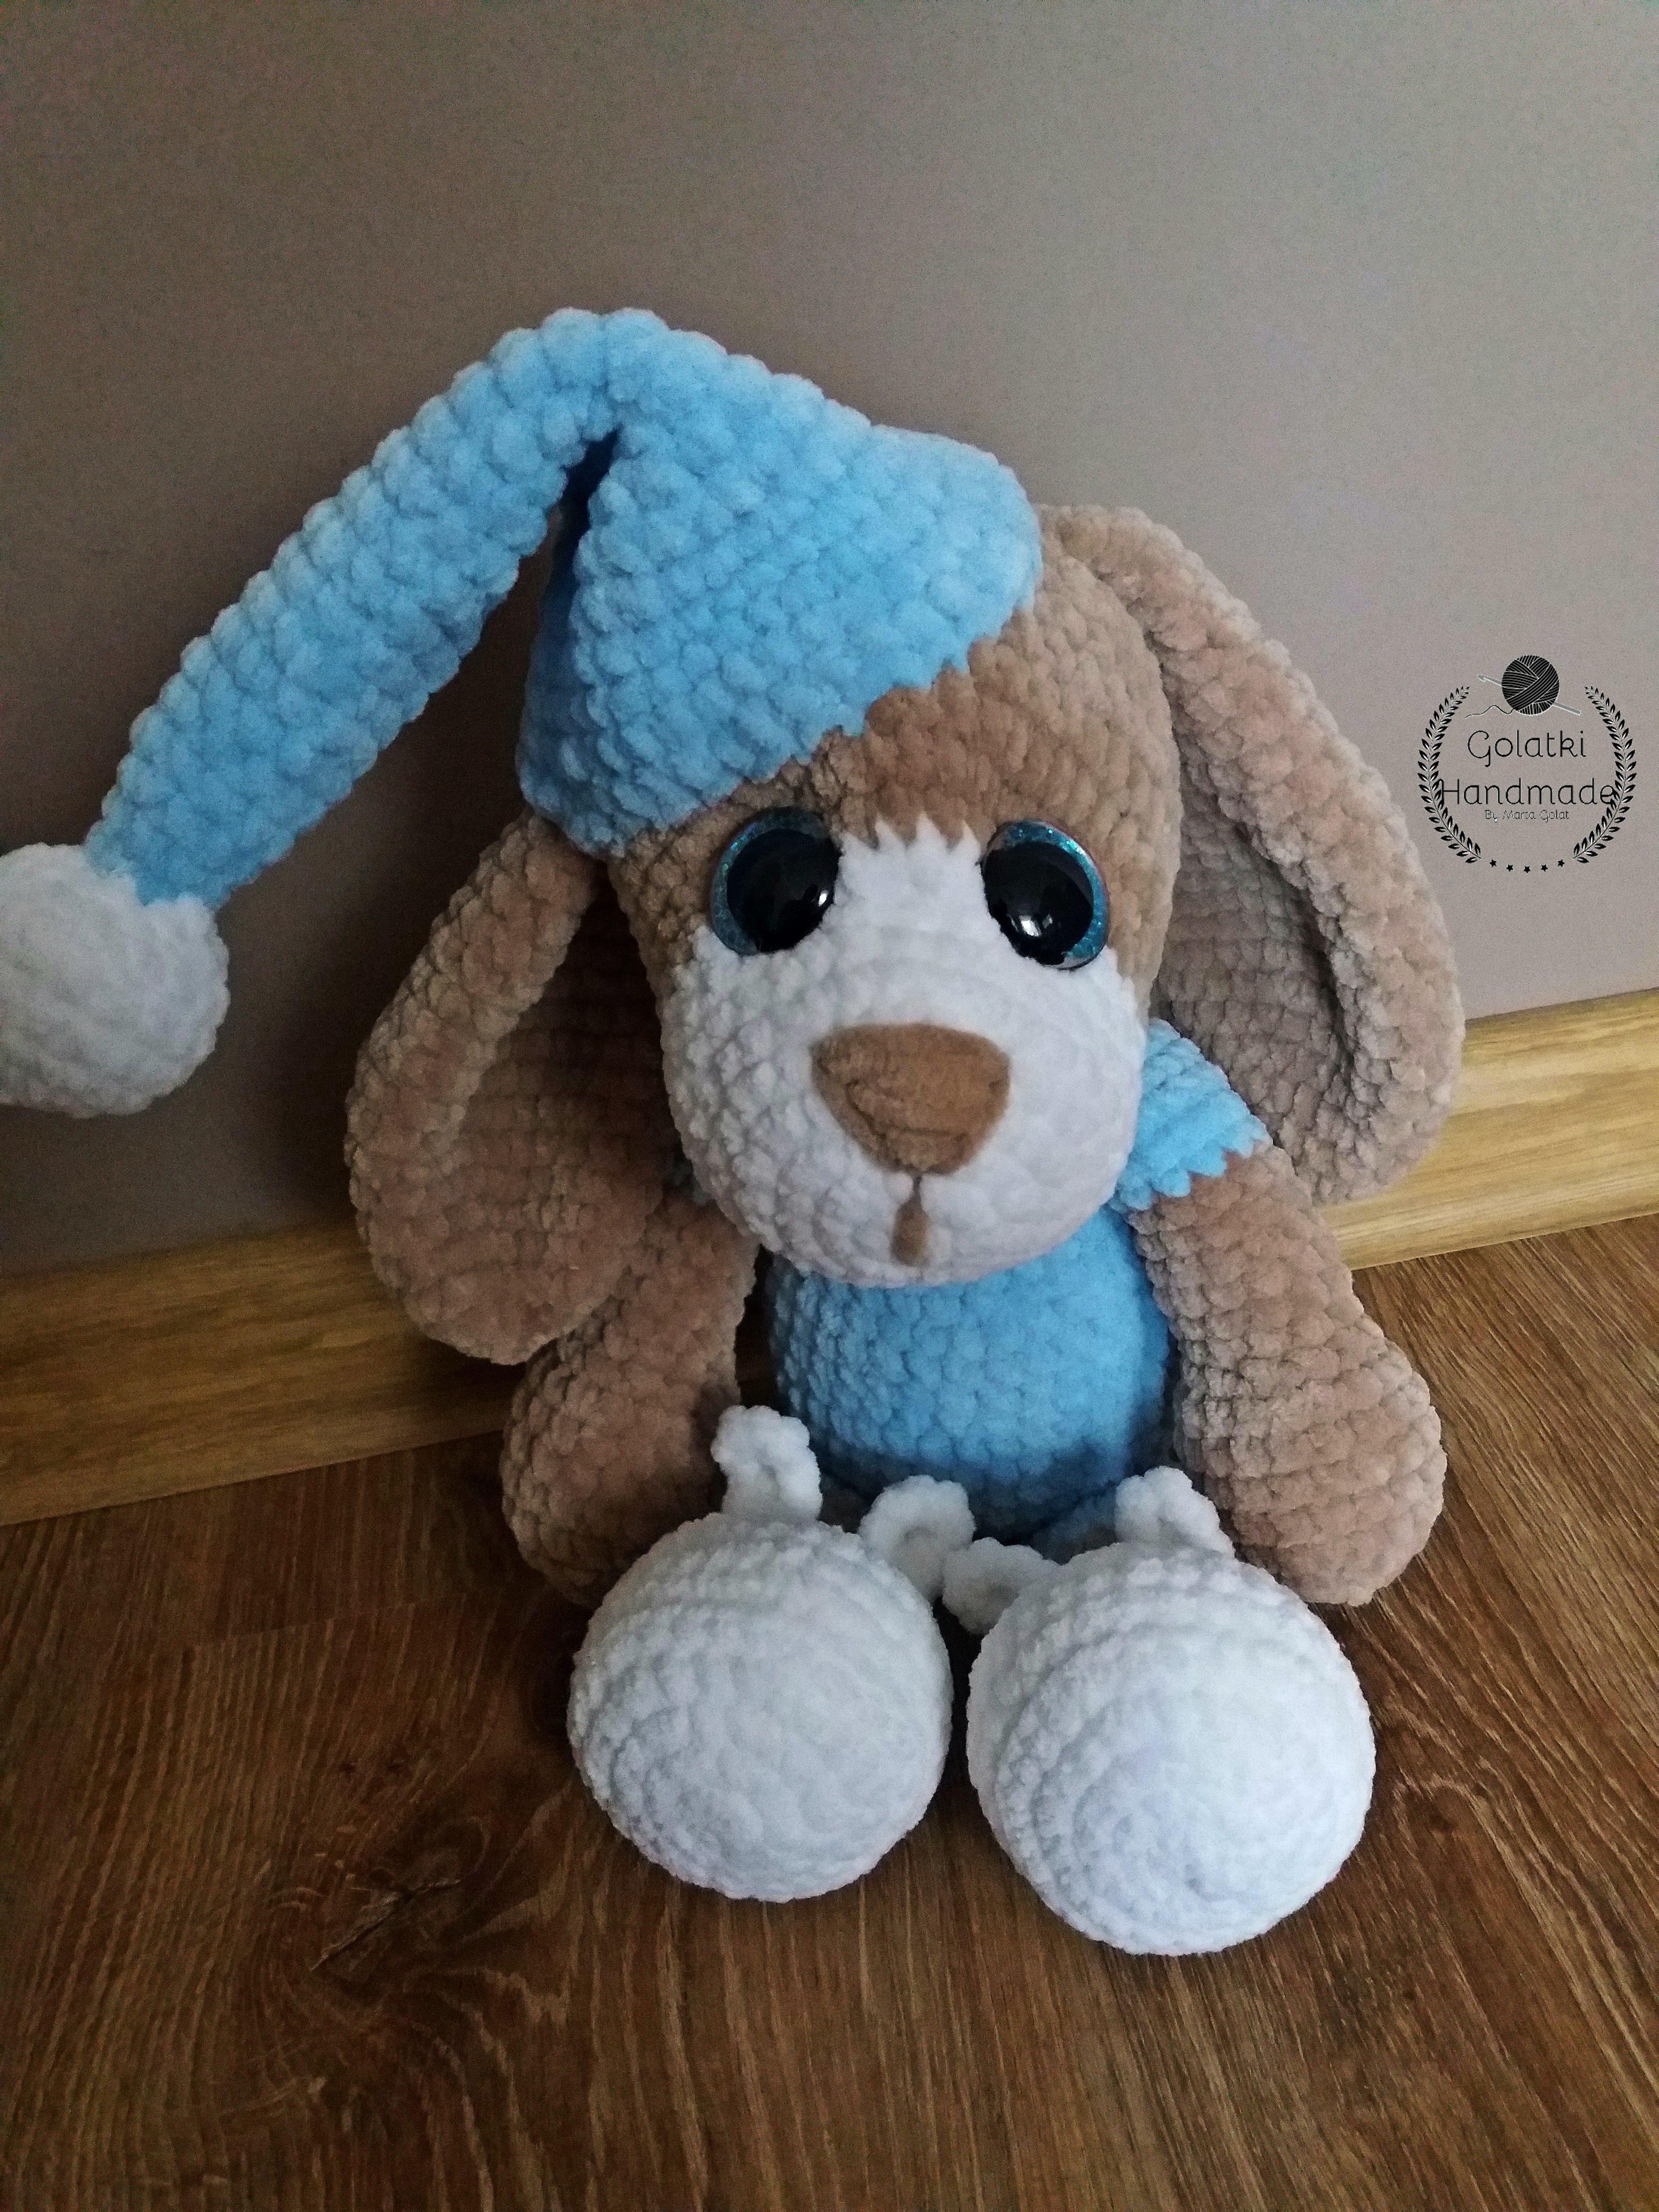 Pin By Golatki Handmade On Crochet Himalaya Dolphin Puppies In Pajamas Crochet Toys Wool